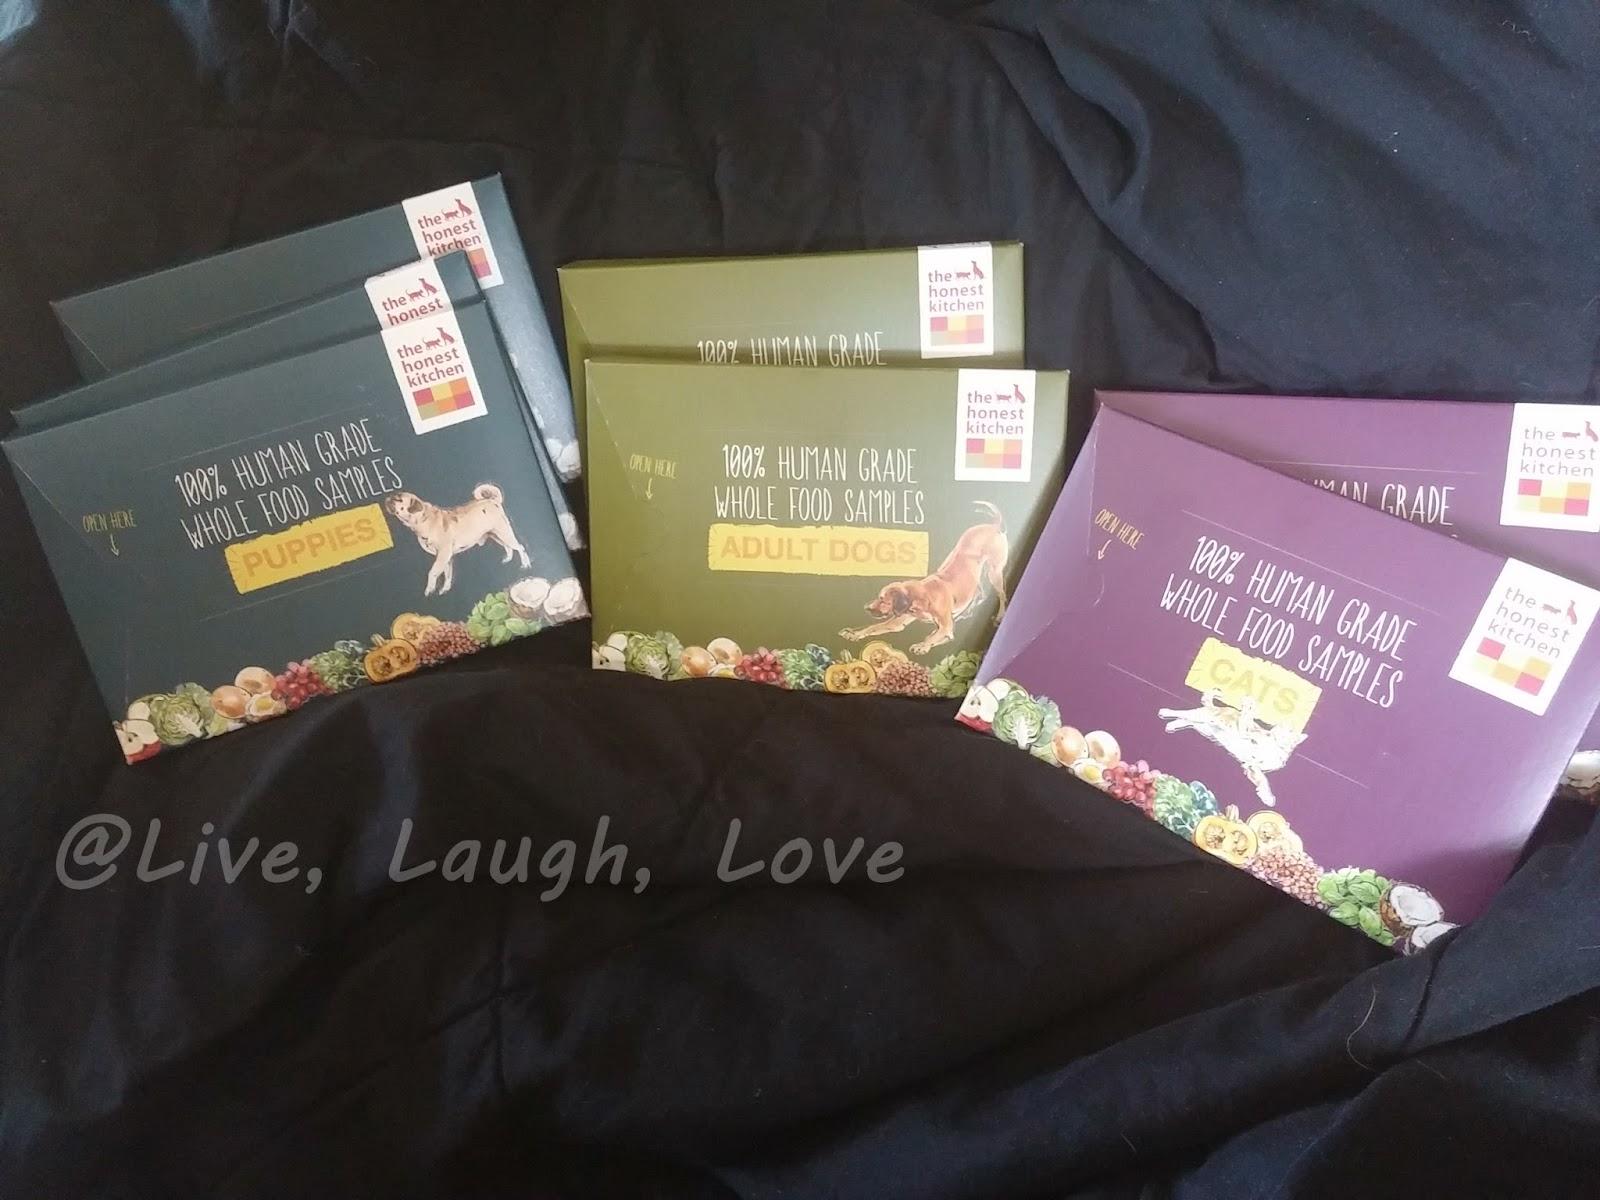 Live, Laugh, Love: The Honest Kitchen Review